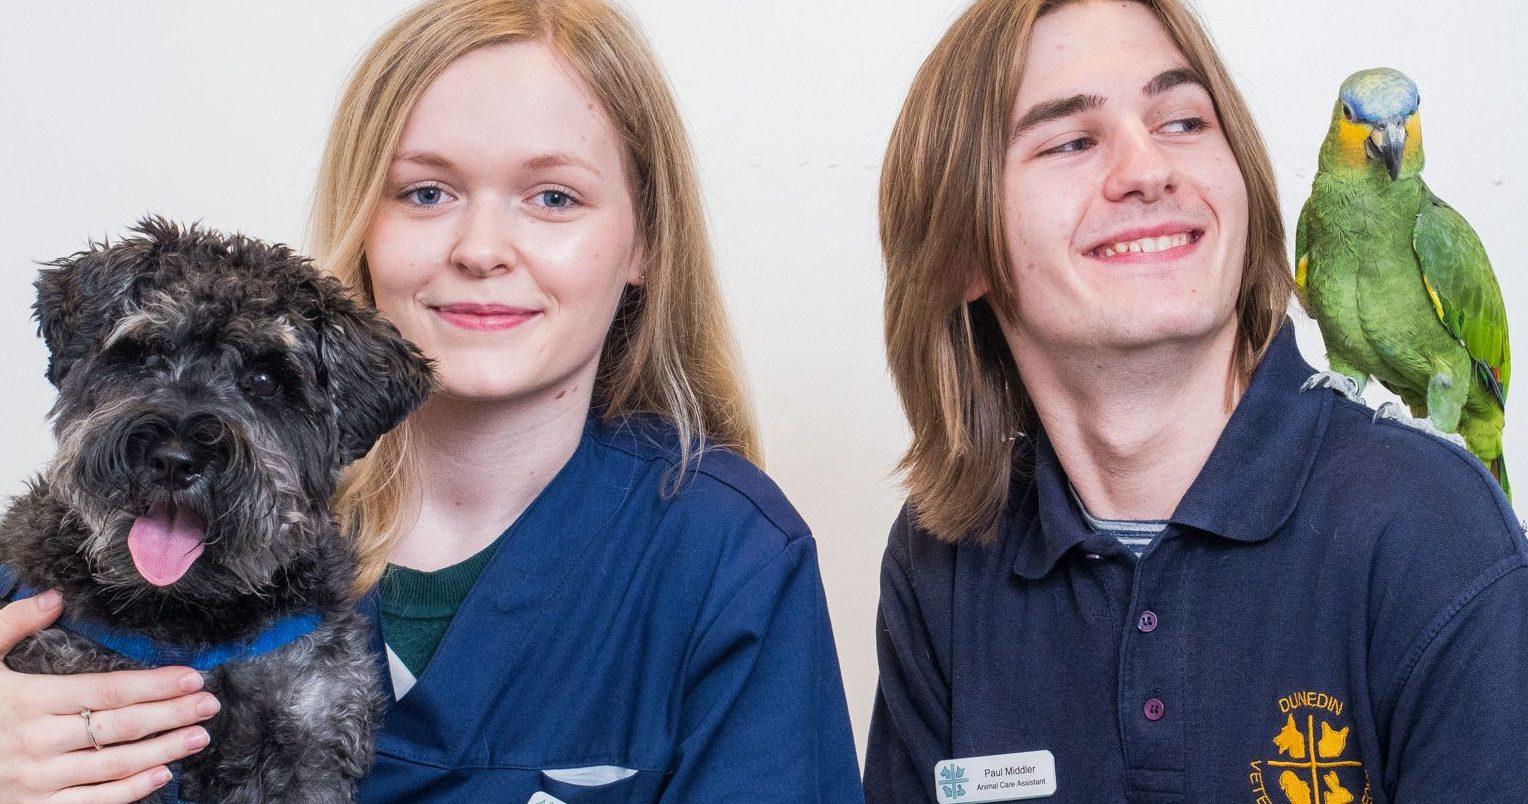 Dunedin Vets pair on path to dream career as veterinary nurses